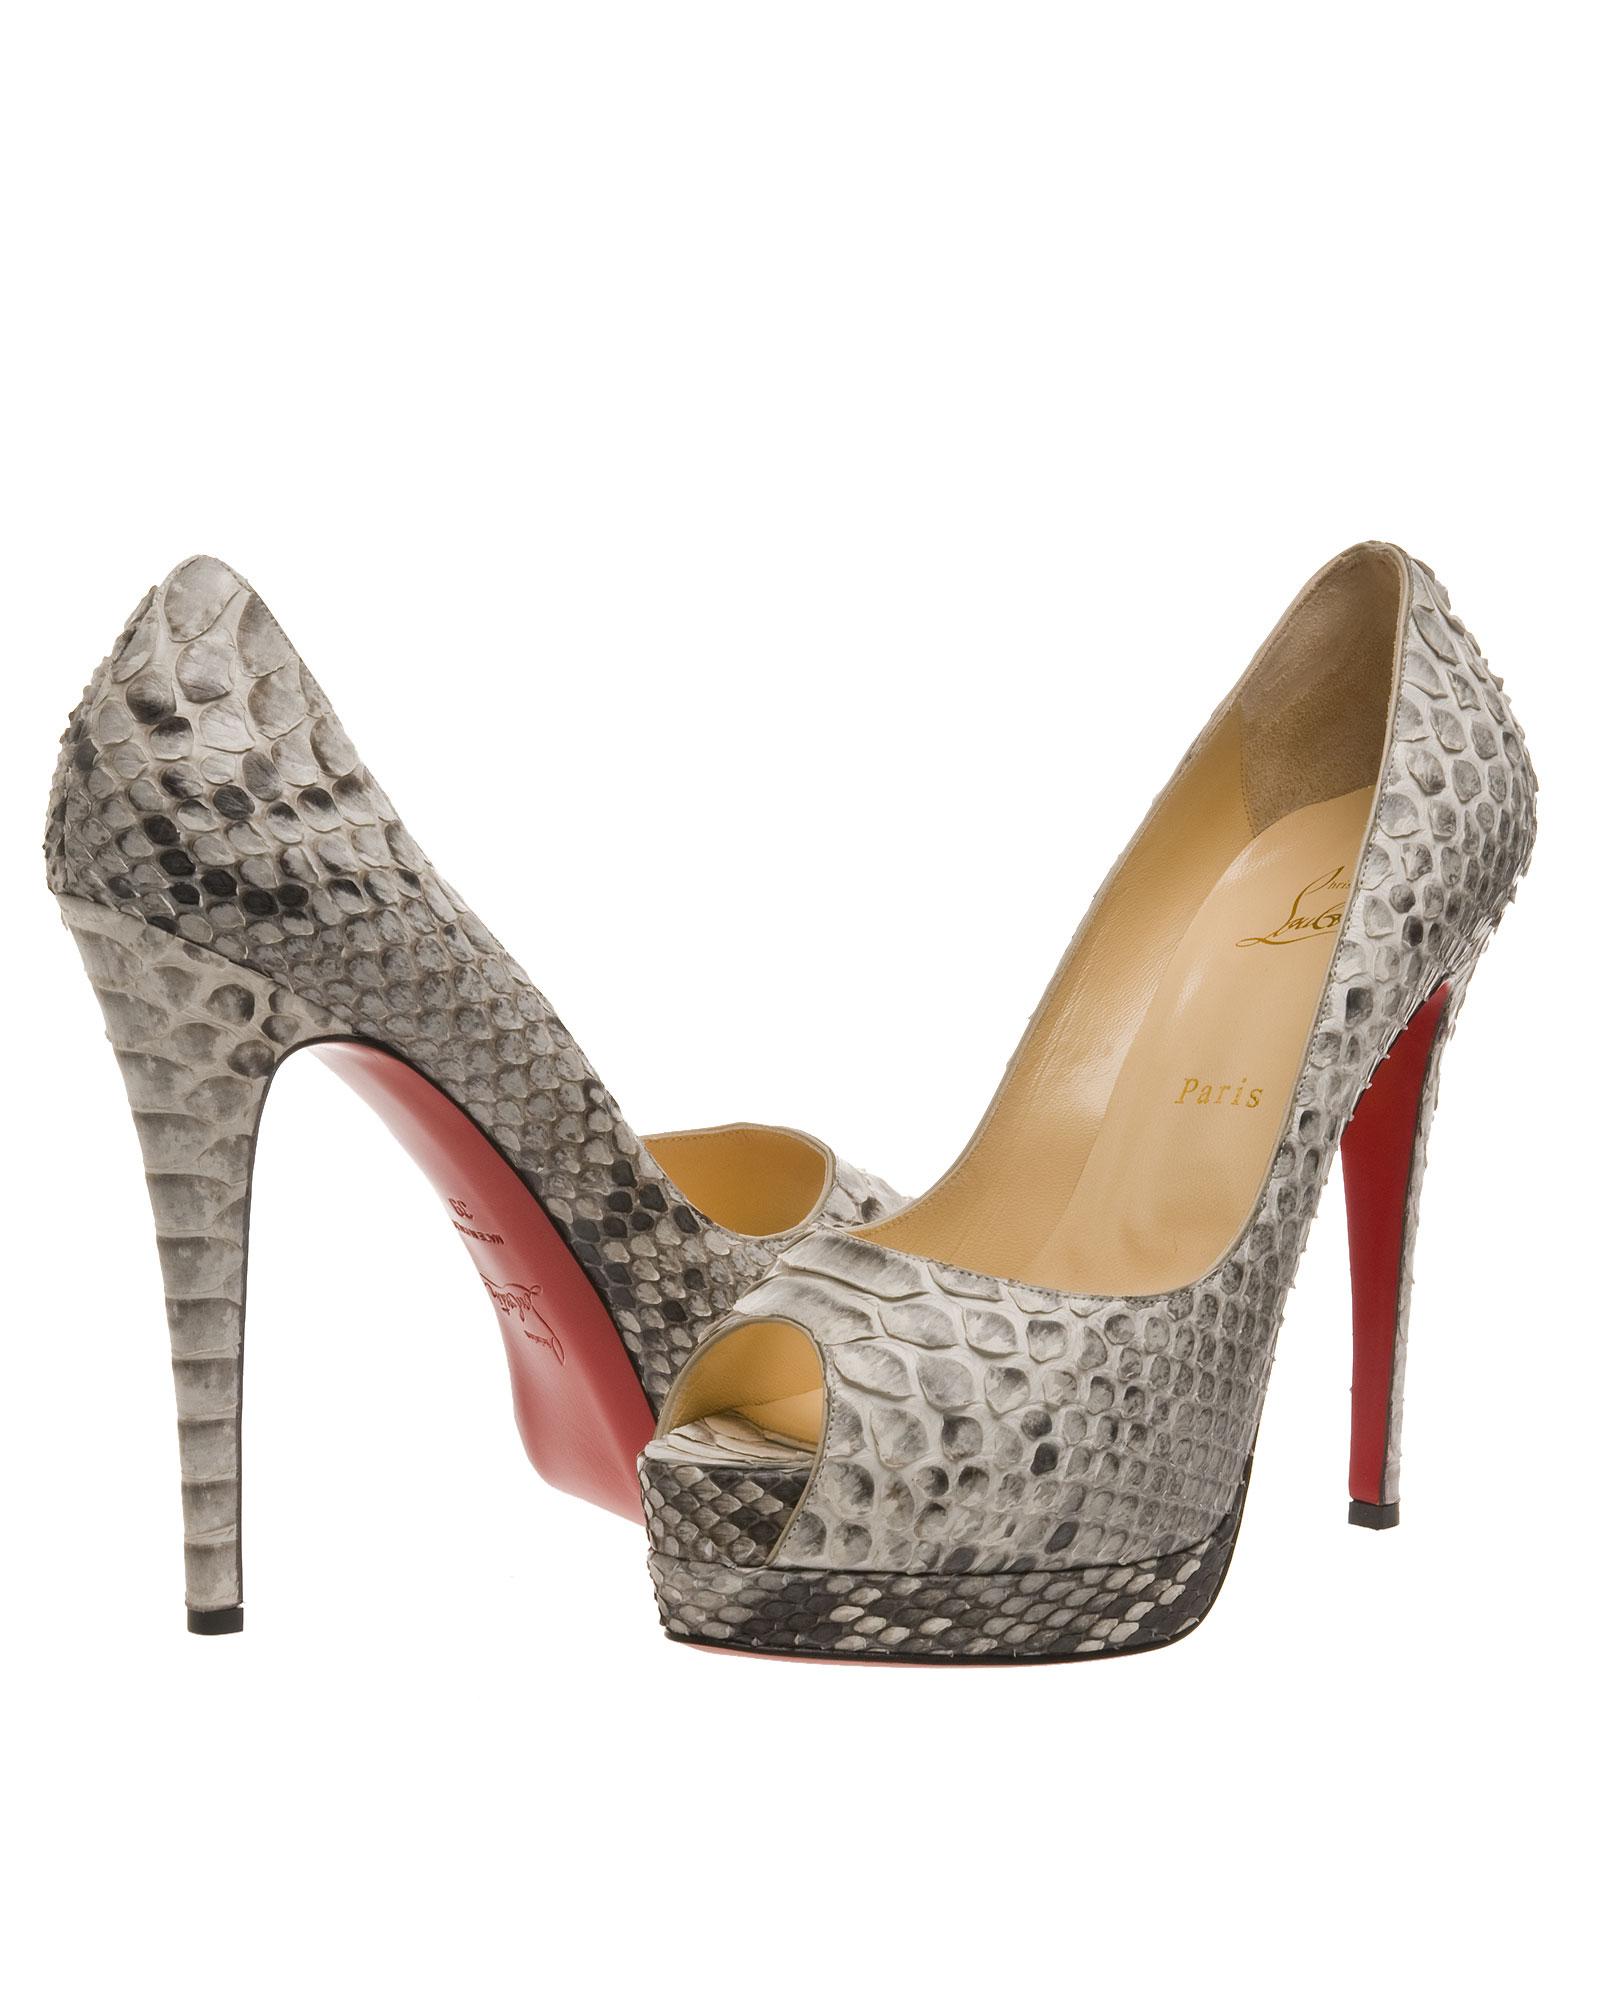 christian louboutin shoe prices - christian louboutin peep-toe pumps Grey snakeskin - Bbridges